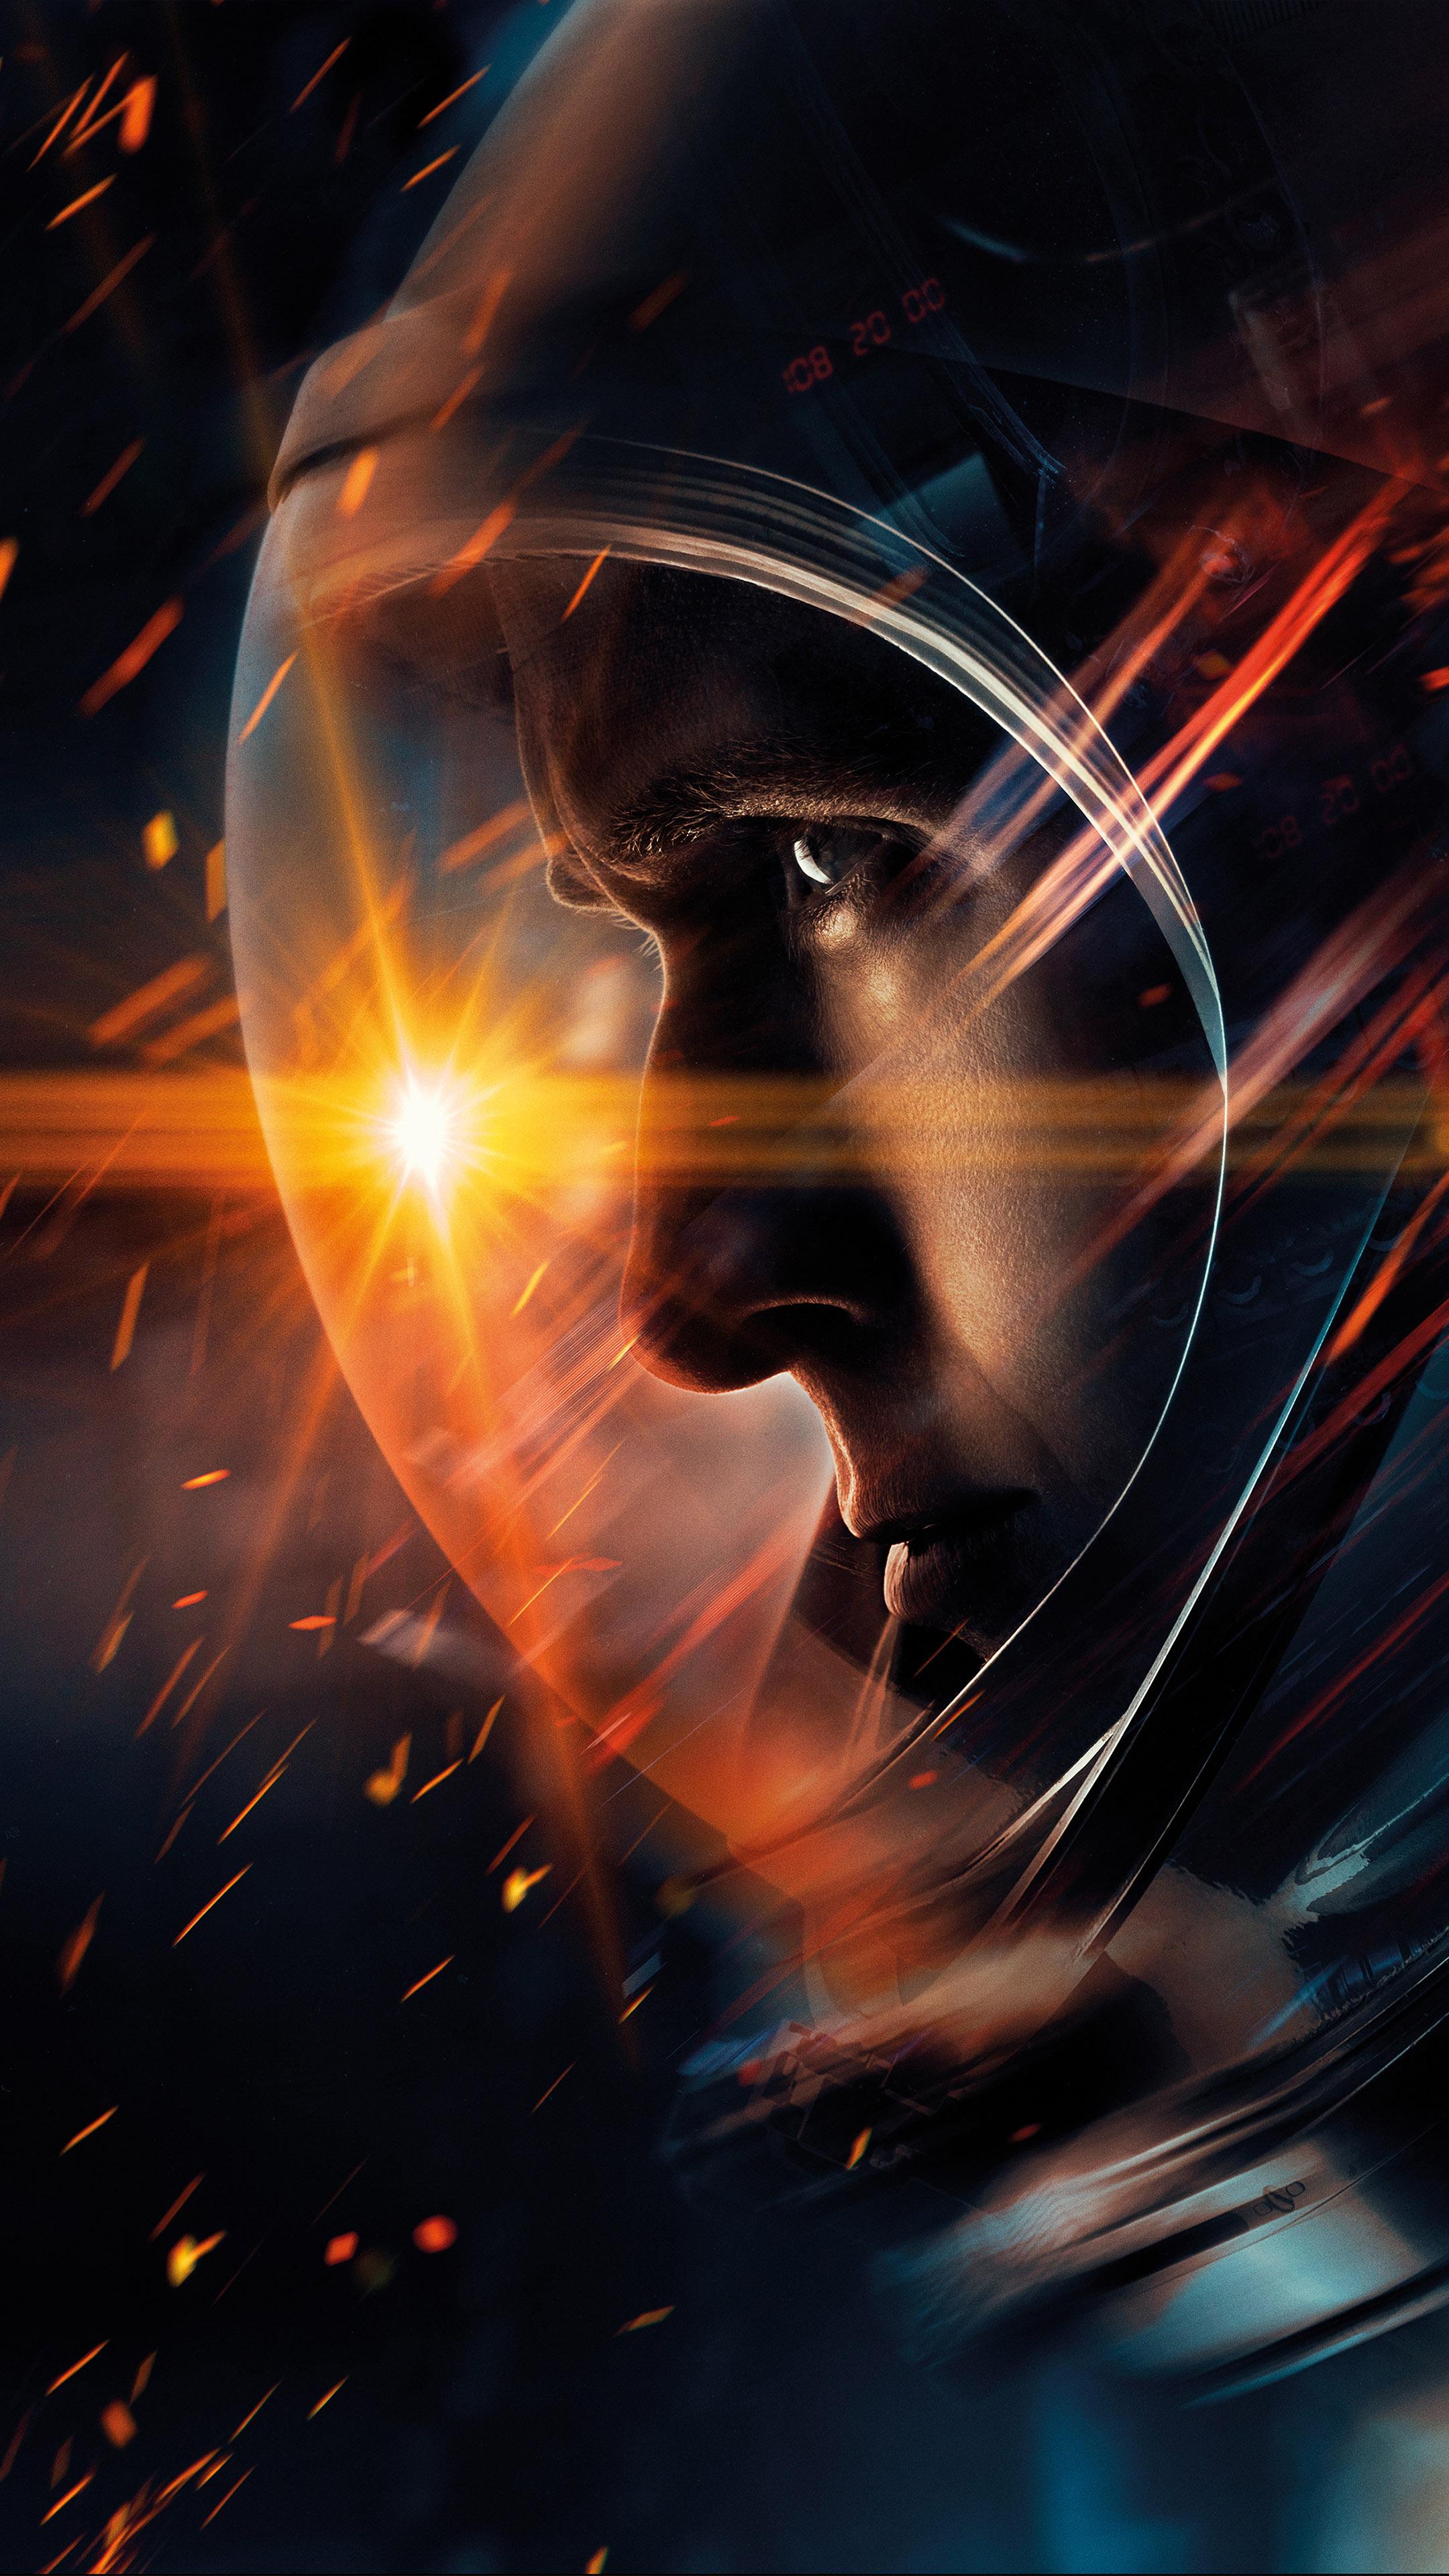 Download Ryan Gosling In First Man Free Pure 4k Ultra Hd